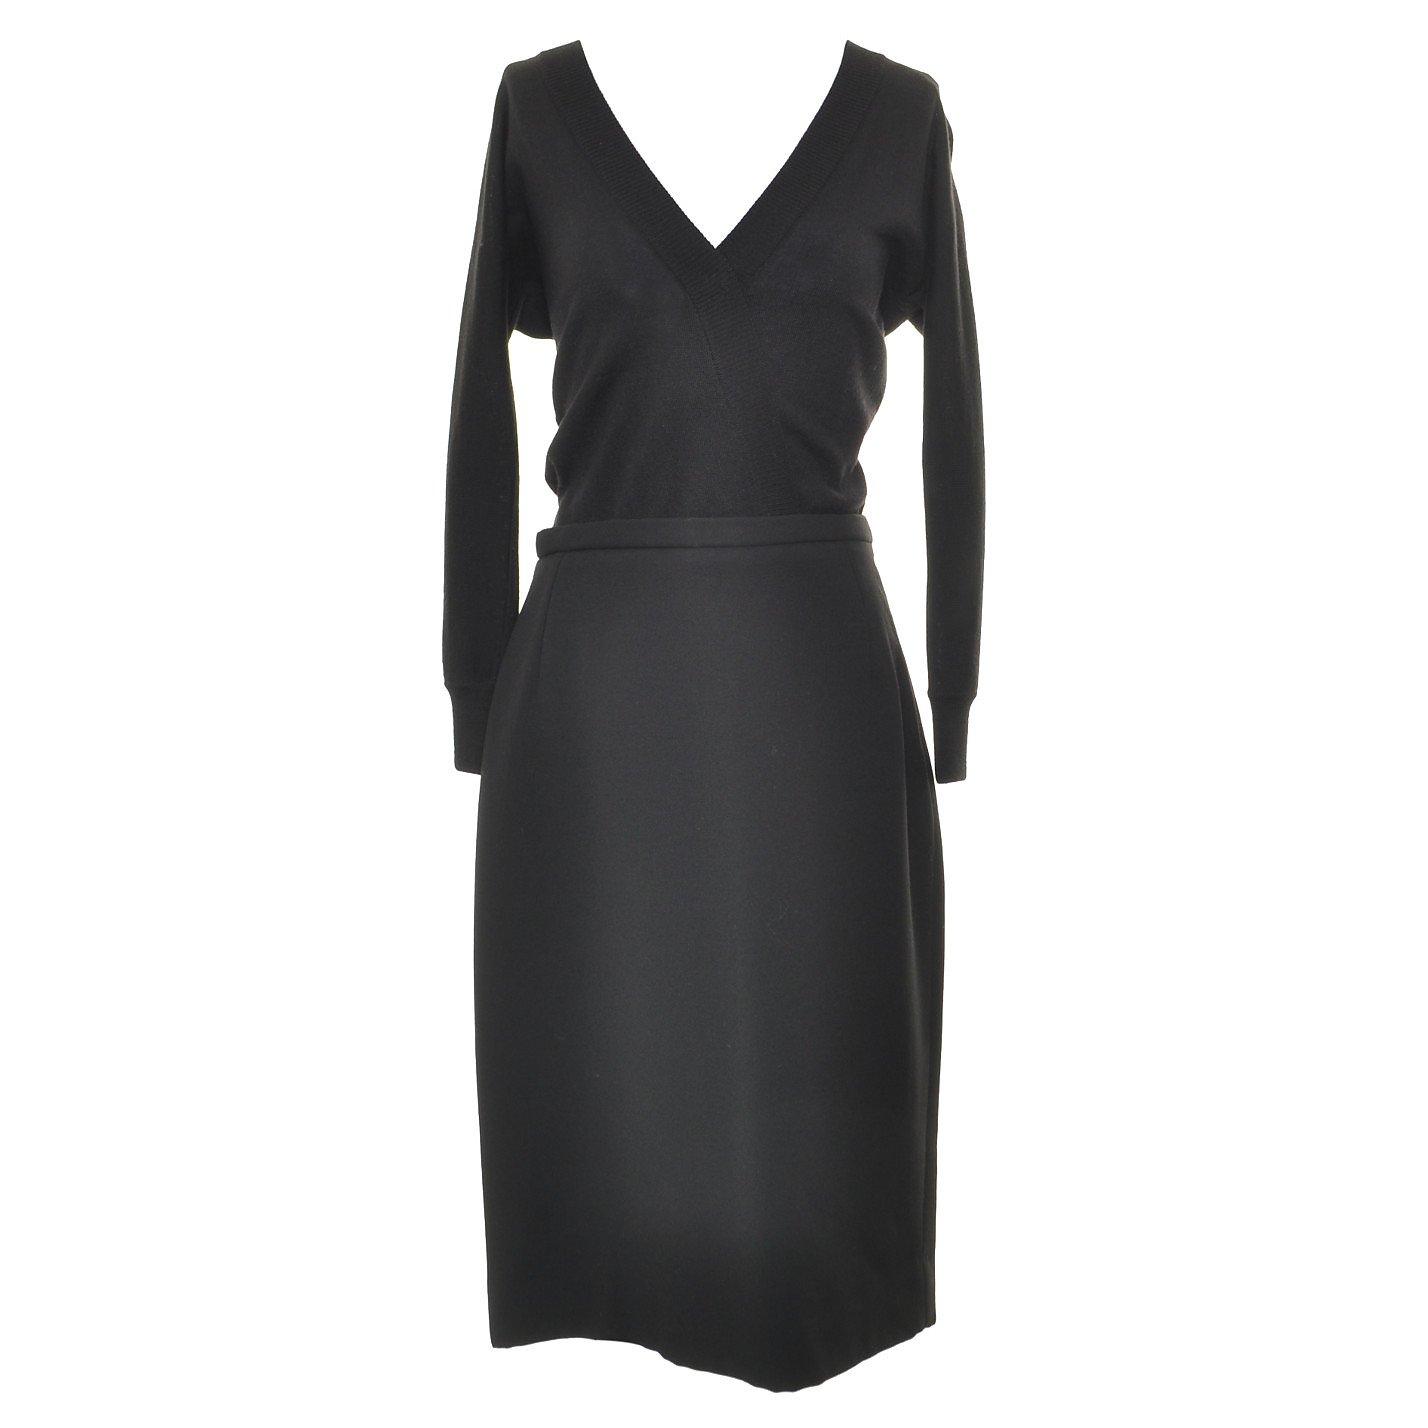 DOLCE & GABBANA Cardigan-Effect Knit Dress